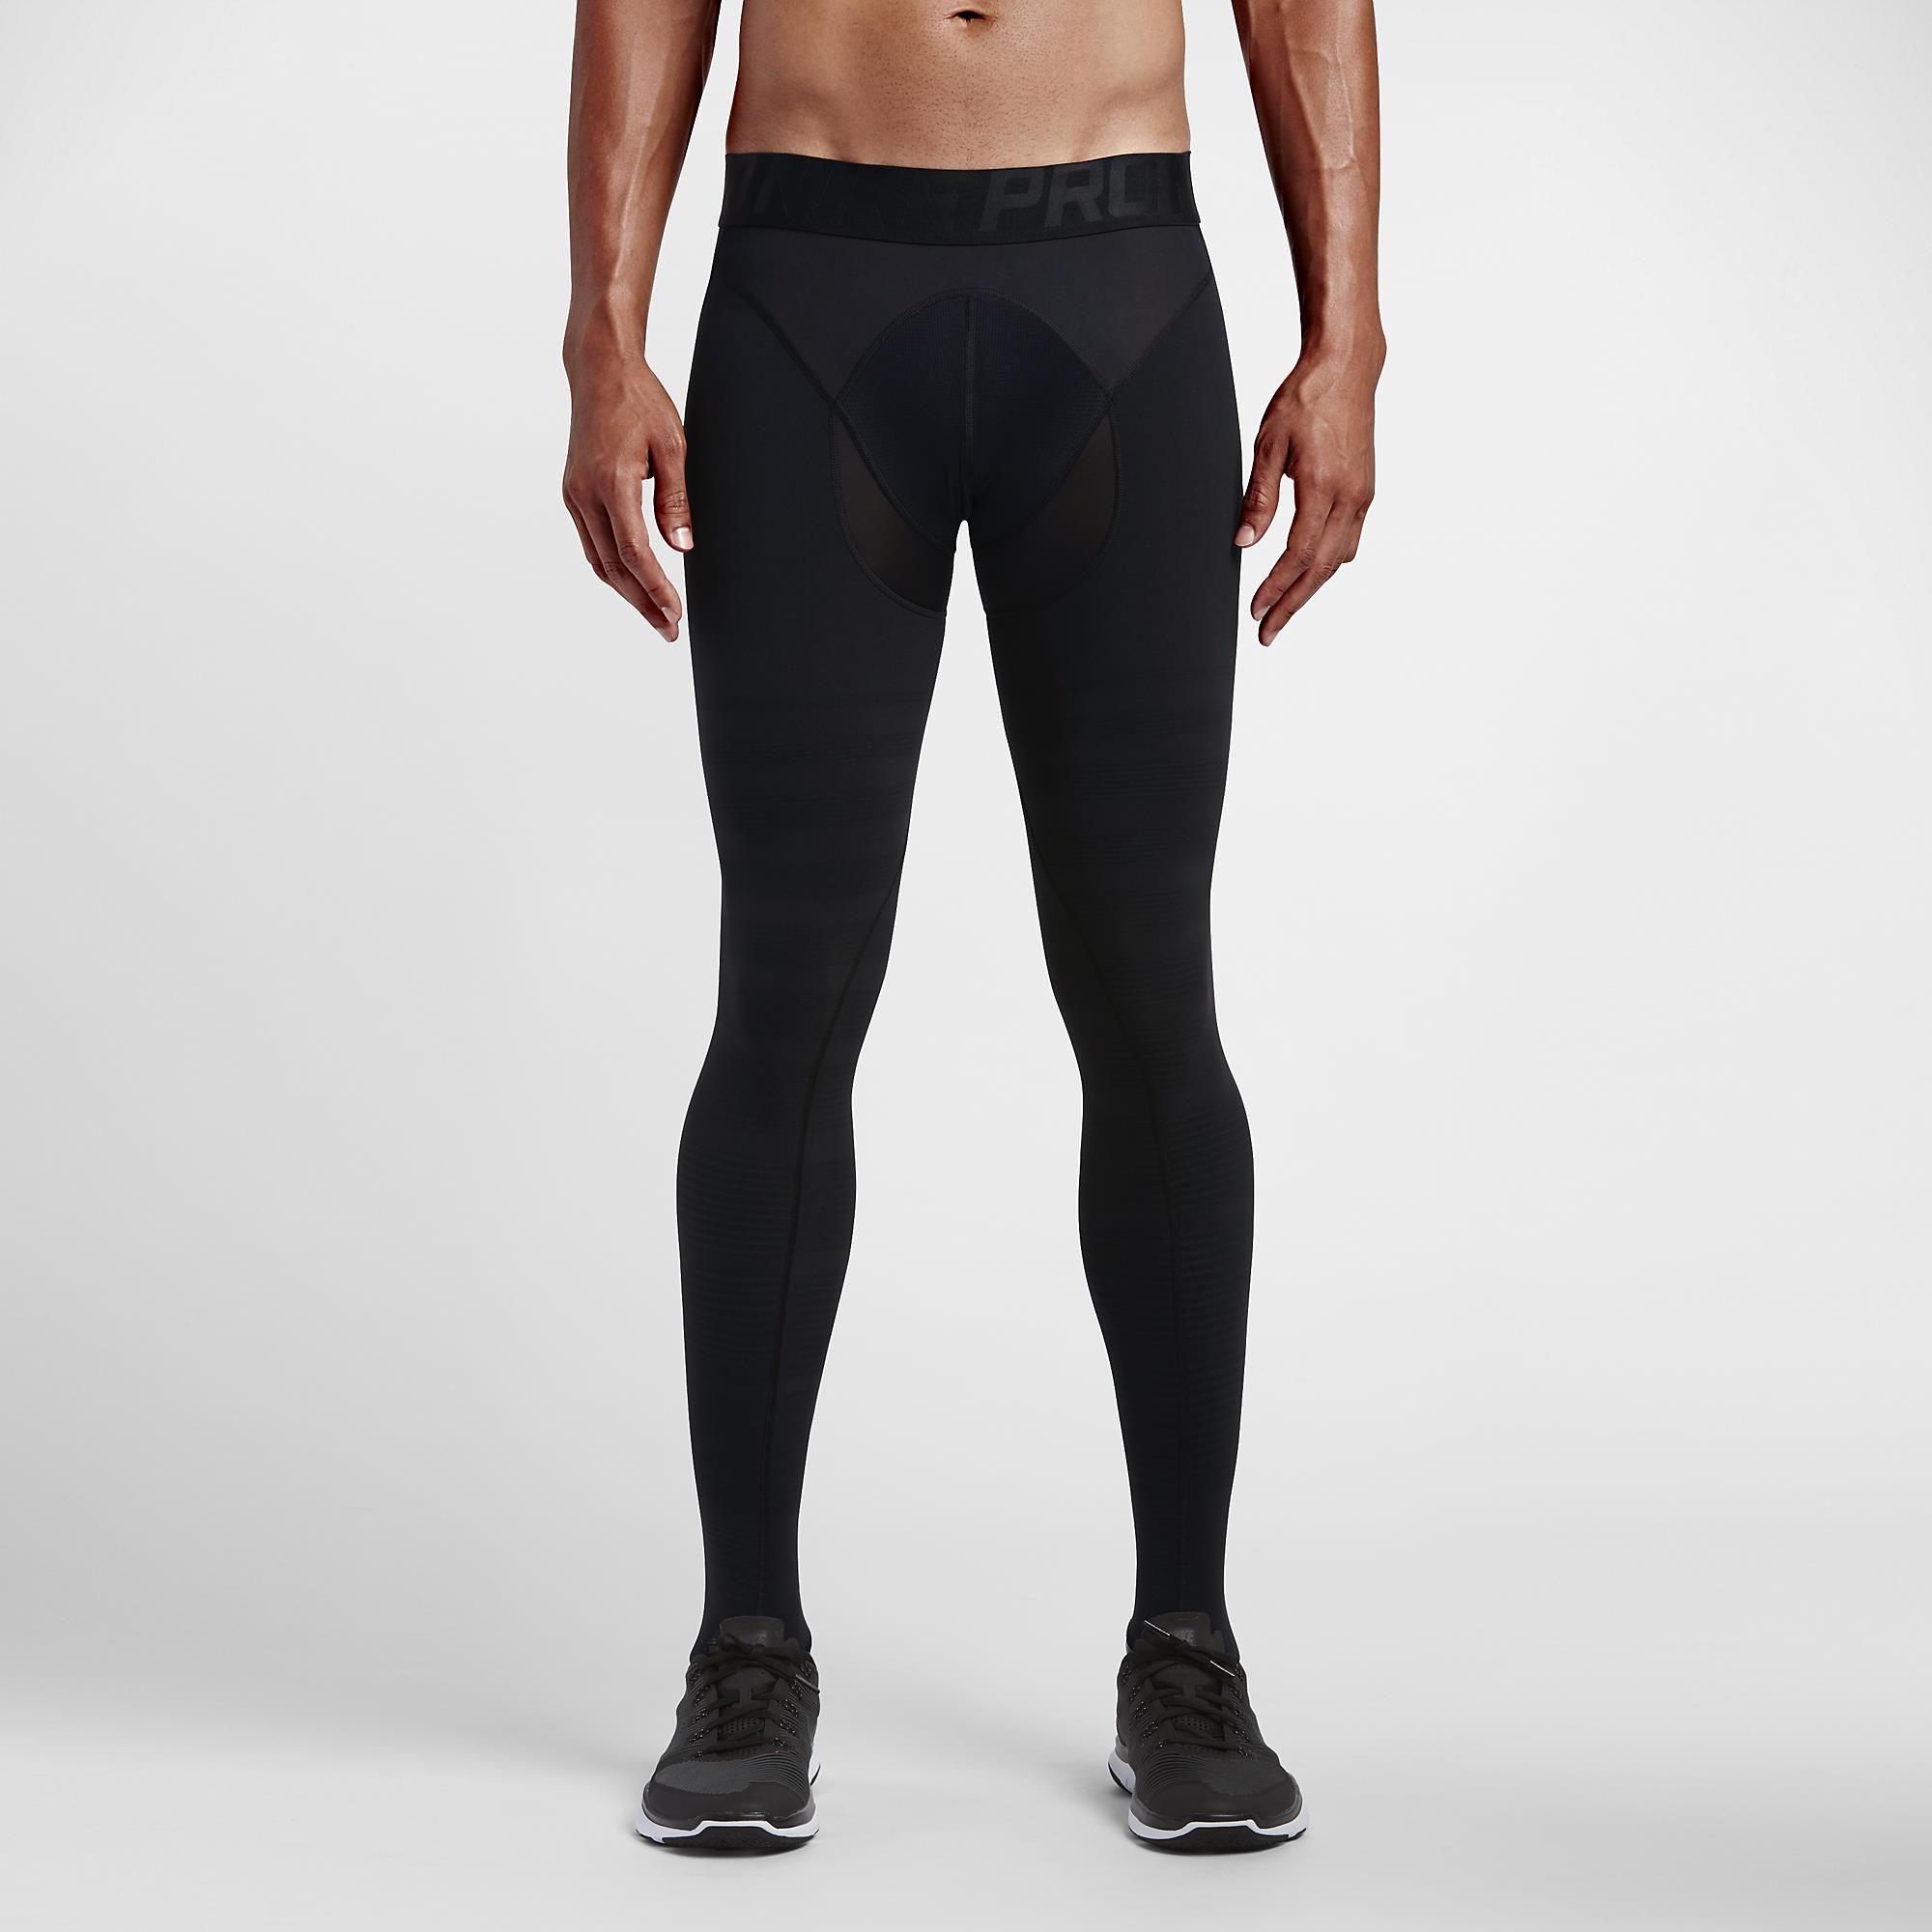 Legging Nike Pro Hyperrecovery Tight Masculina  2feb4224c73a0